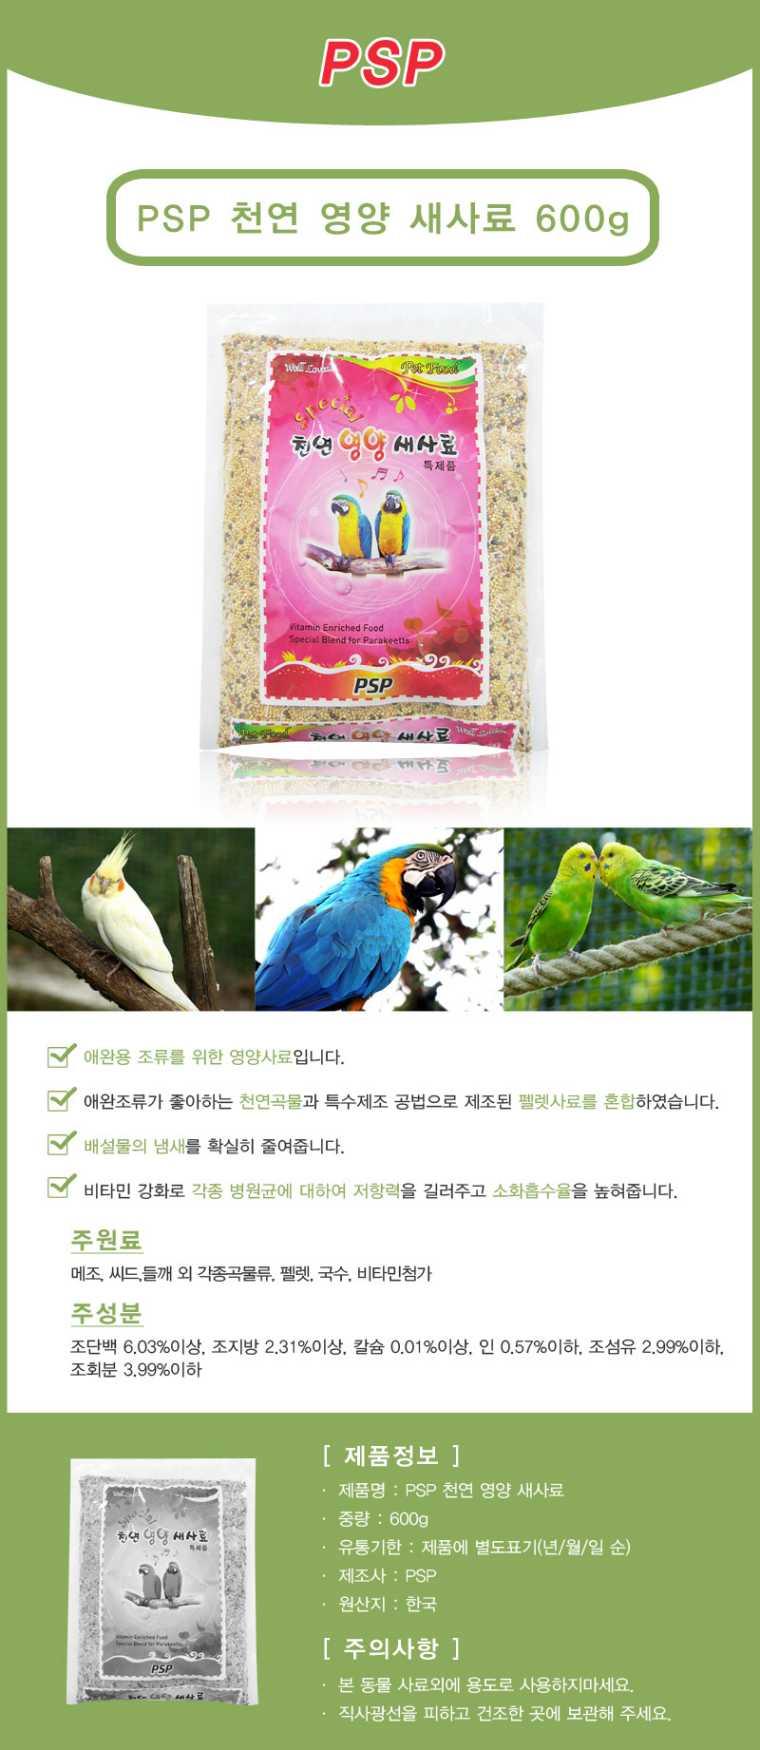 PSP 천연영양 새사료 600g - 바니펫, 3,000원, 조류용품, 사료/모이